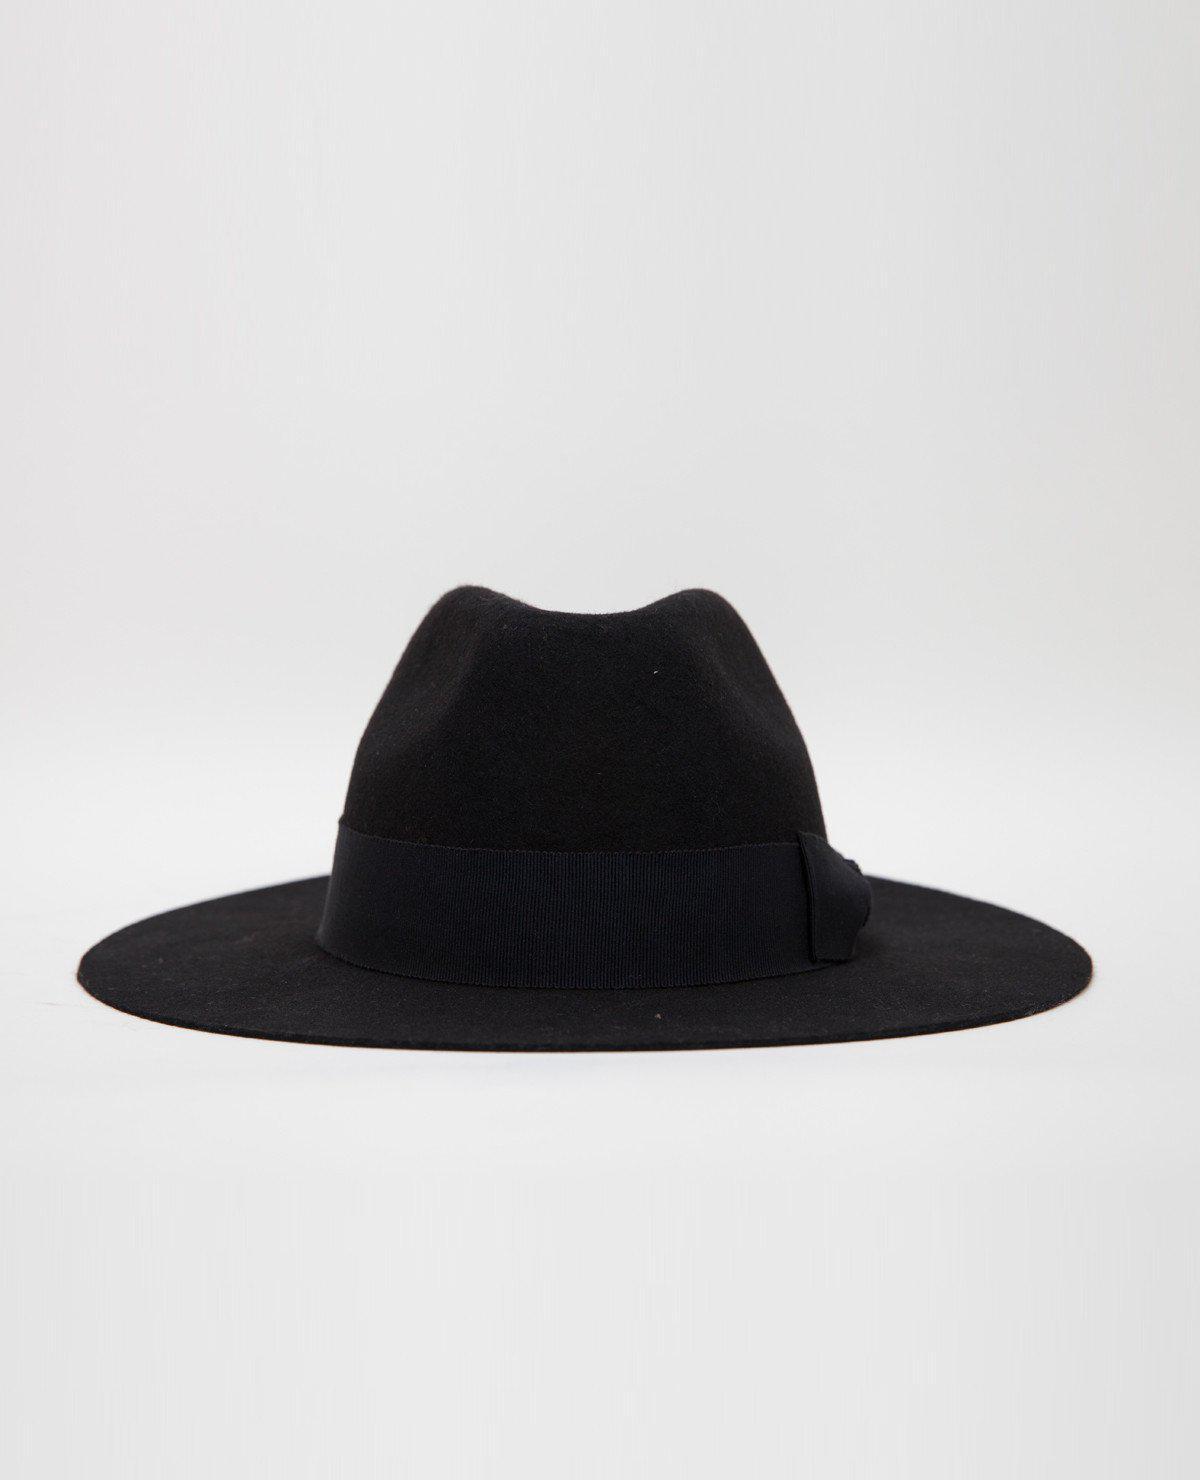 3e2a1bd13f63c Soulland Bille Fedora Hat   Black in Black - Lyst